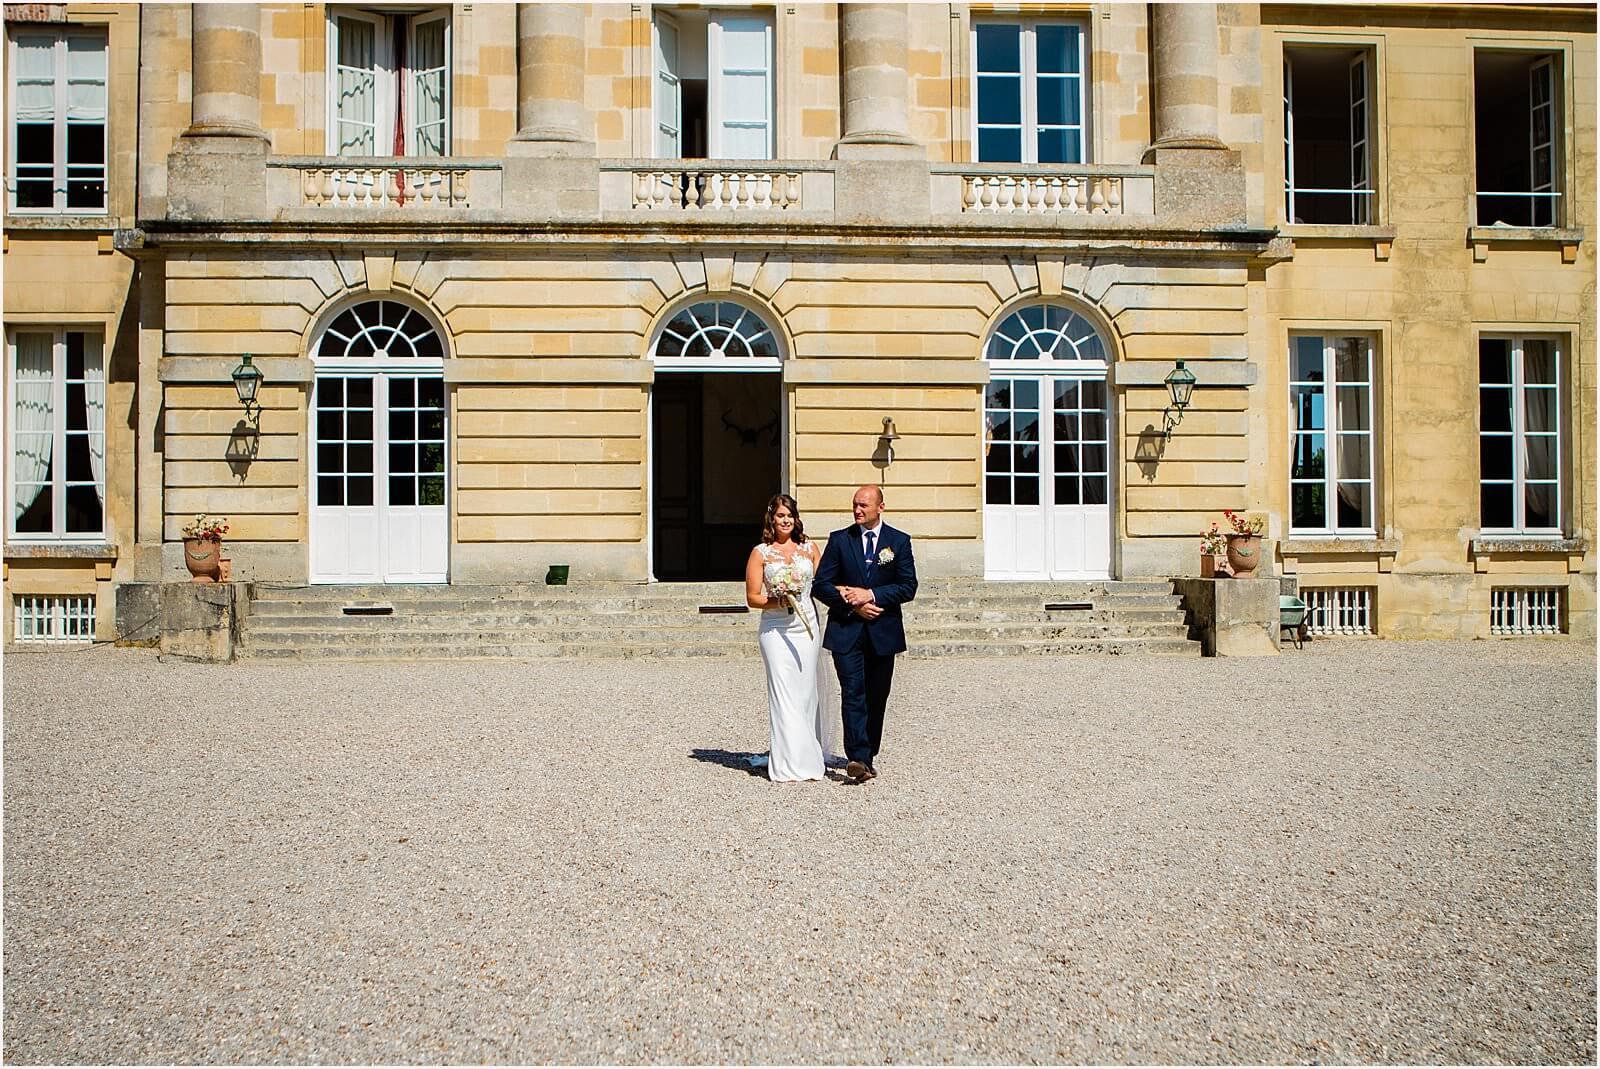 Chateau de Courtomer Wedding | Chantel & Evan 24